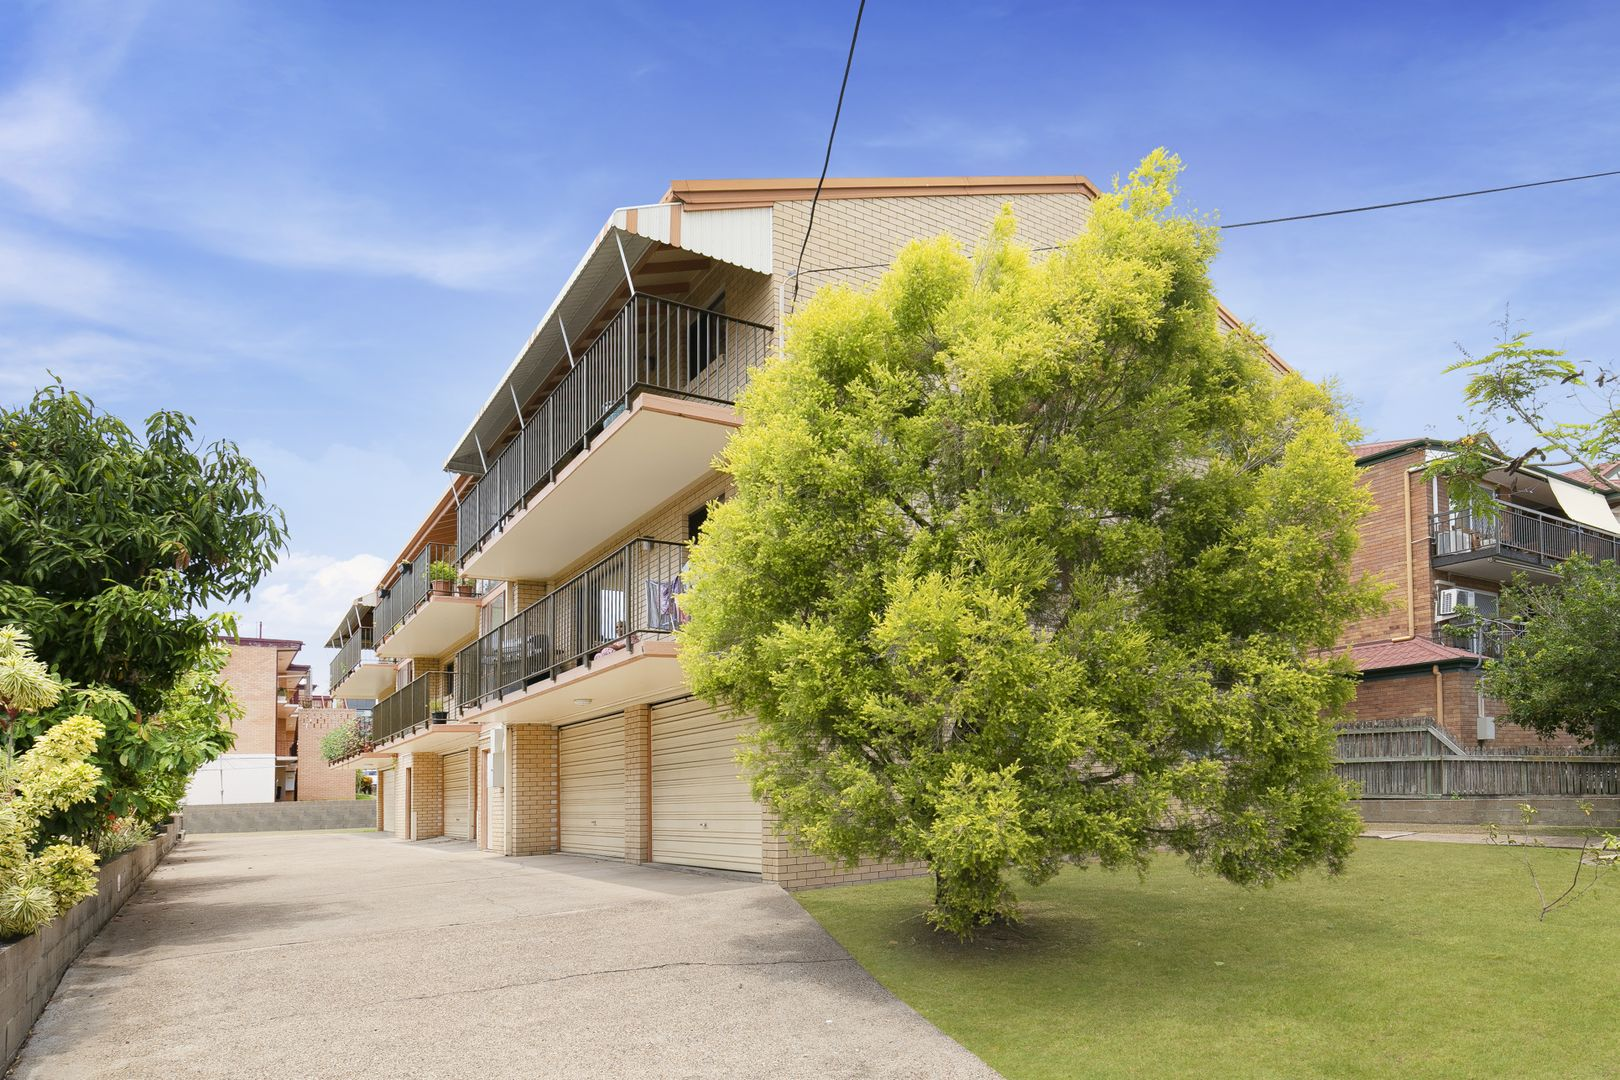 3/16 Mansfield Street, Coorparoo QLD 4151, Image 0